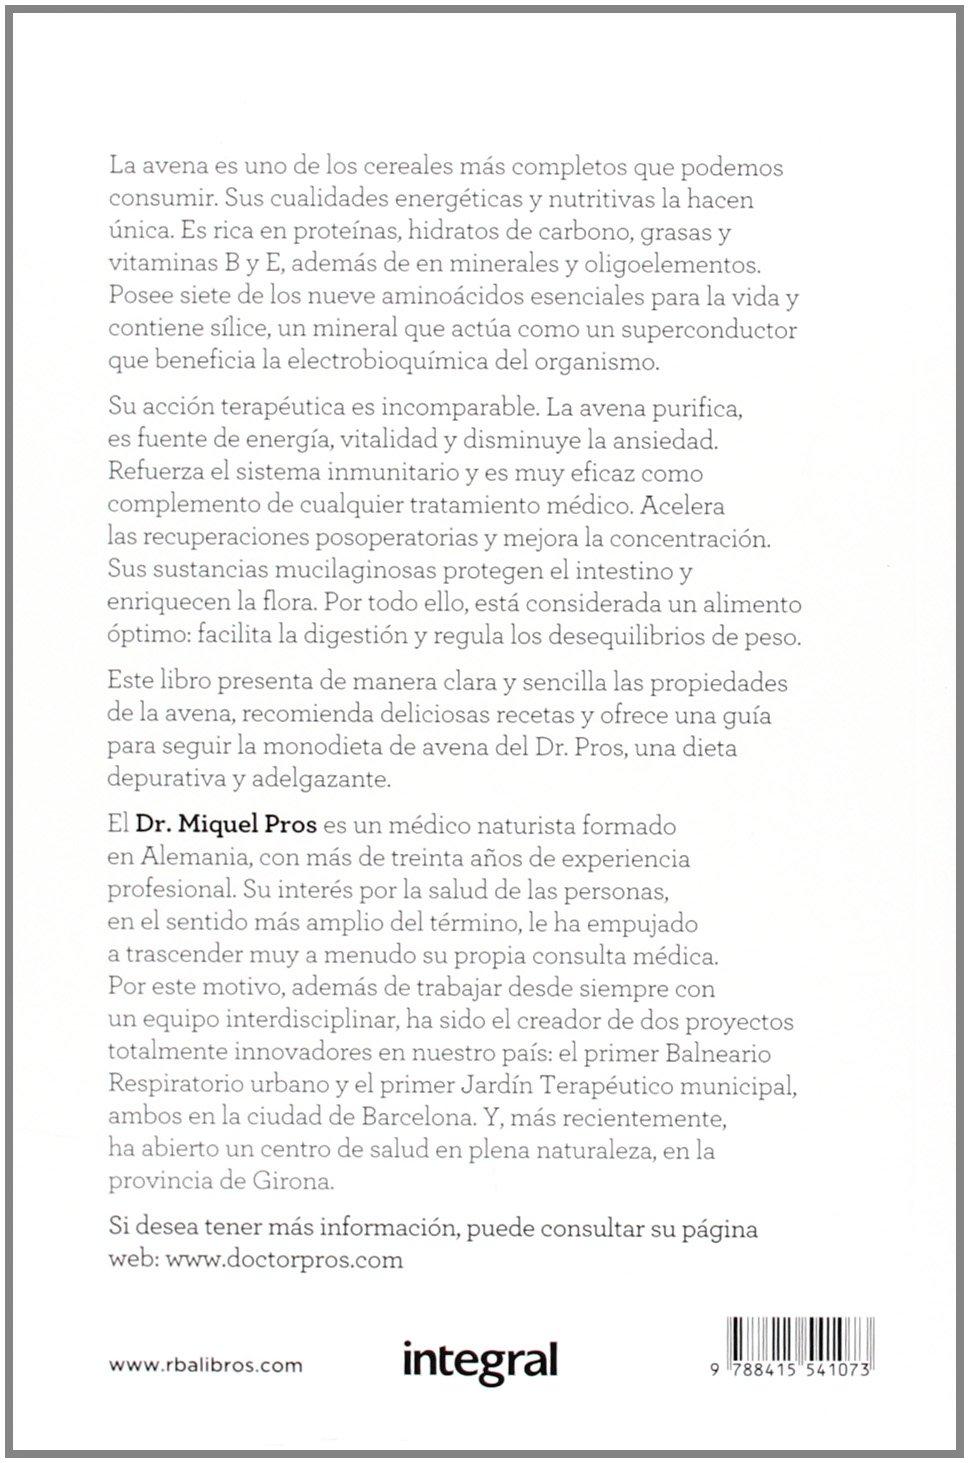 Como cura la avena: DR. MIQUEL PROS CASAS : 9788415541073: Amazon.com: Books